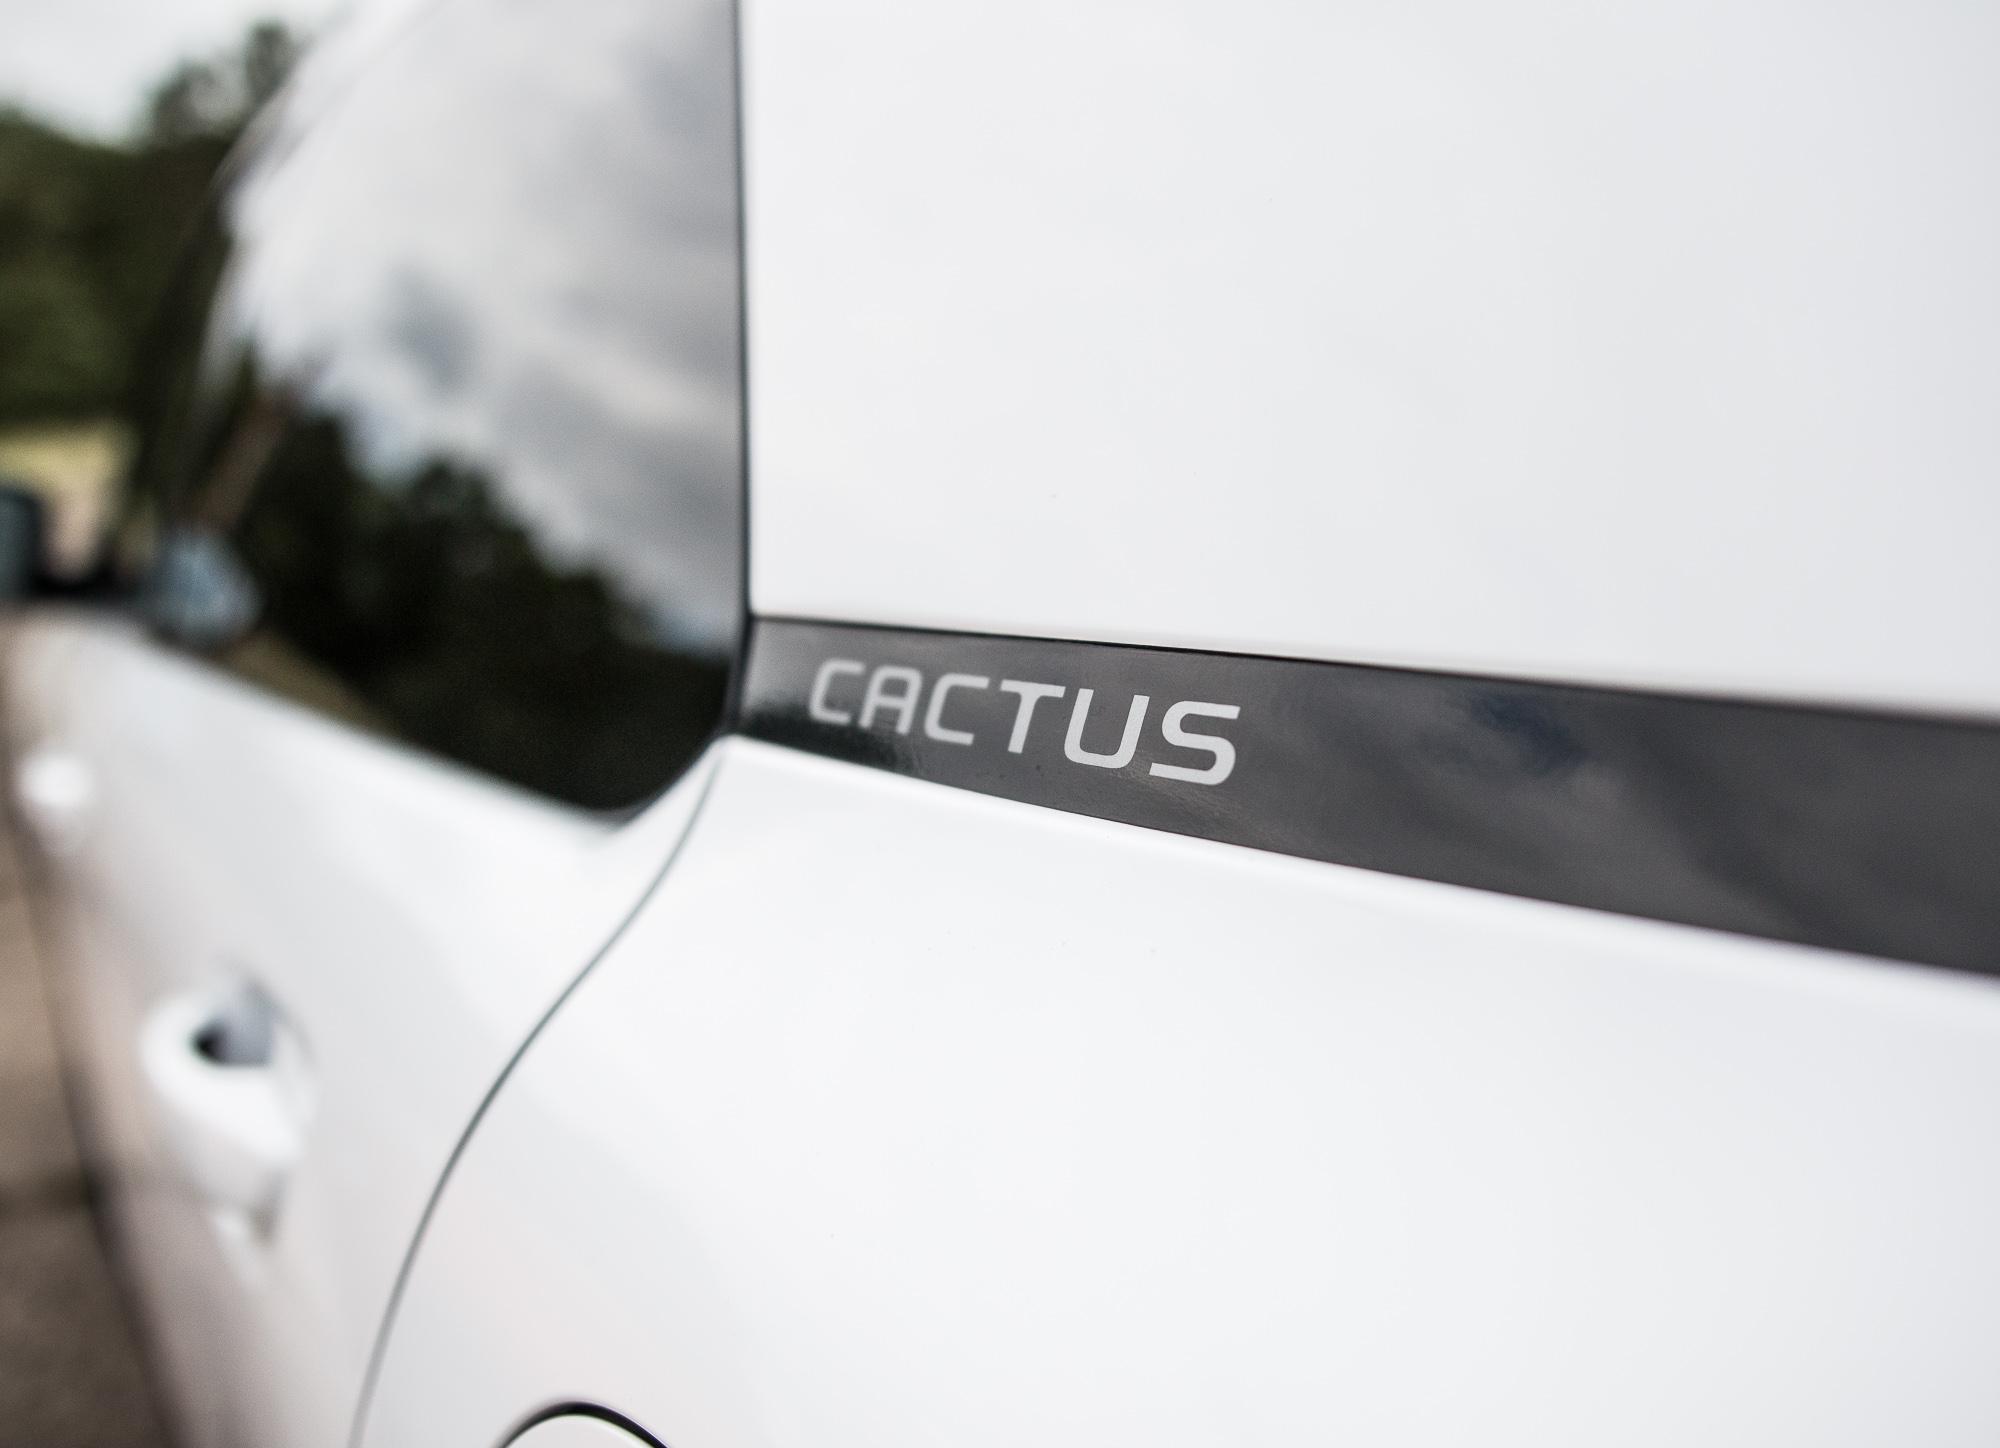 ford-ecosport-citroen-c4-cactus-porownanie-9